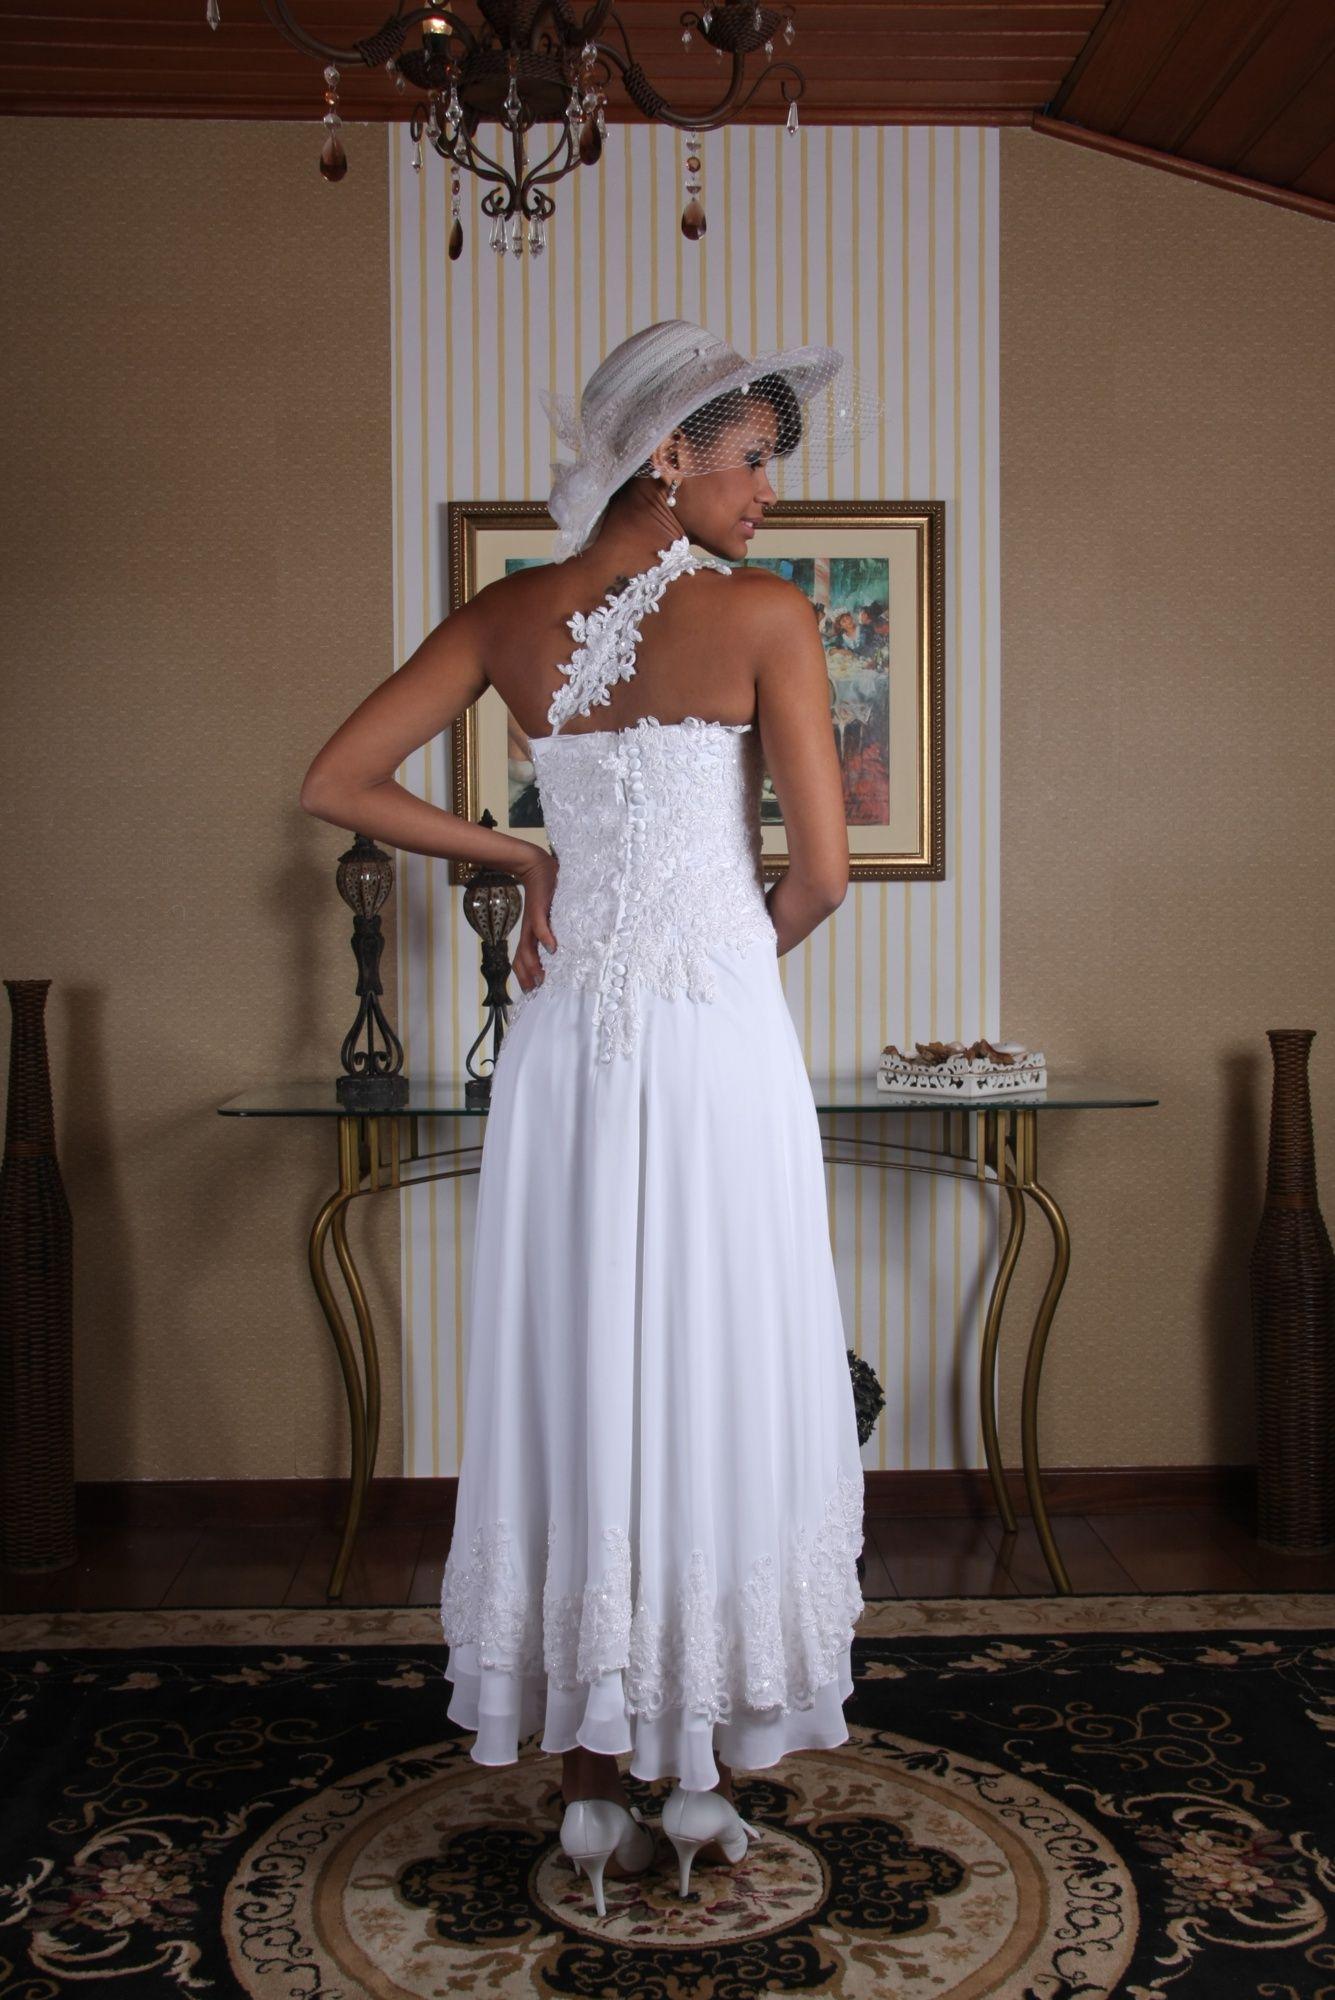 Vestido de Noiva Curto - 1 - Hipnose Alta Costura e Spa para Noivas e Noivos - Campinas - SP Vestido de Noiva, Vestido de Noiva Curto, Hipnose Alta Costura